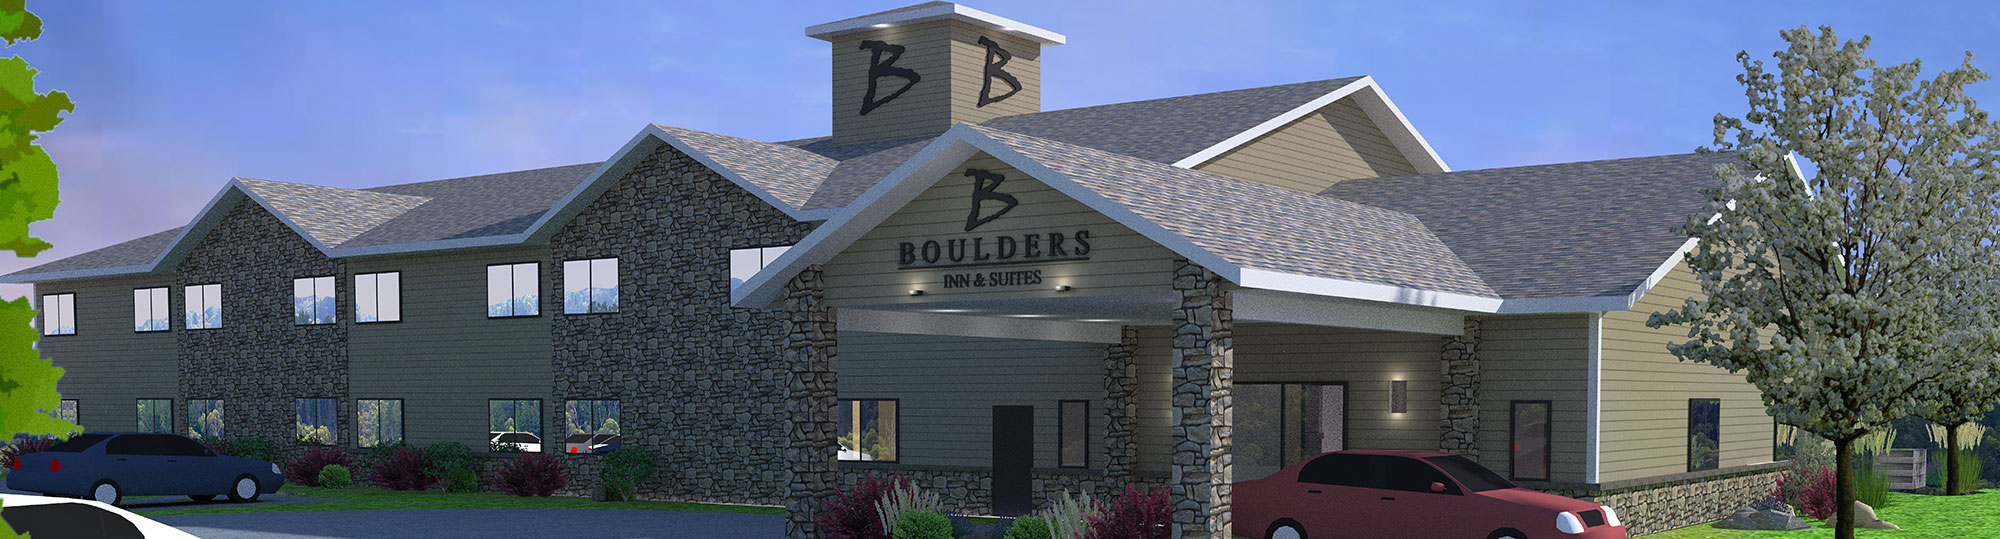 Boulders Inn & Suites Manchester